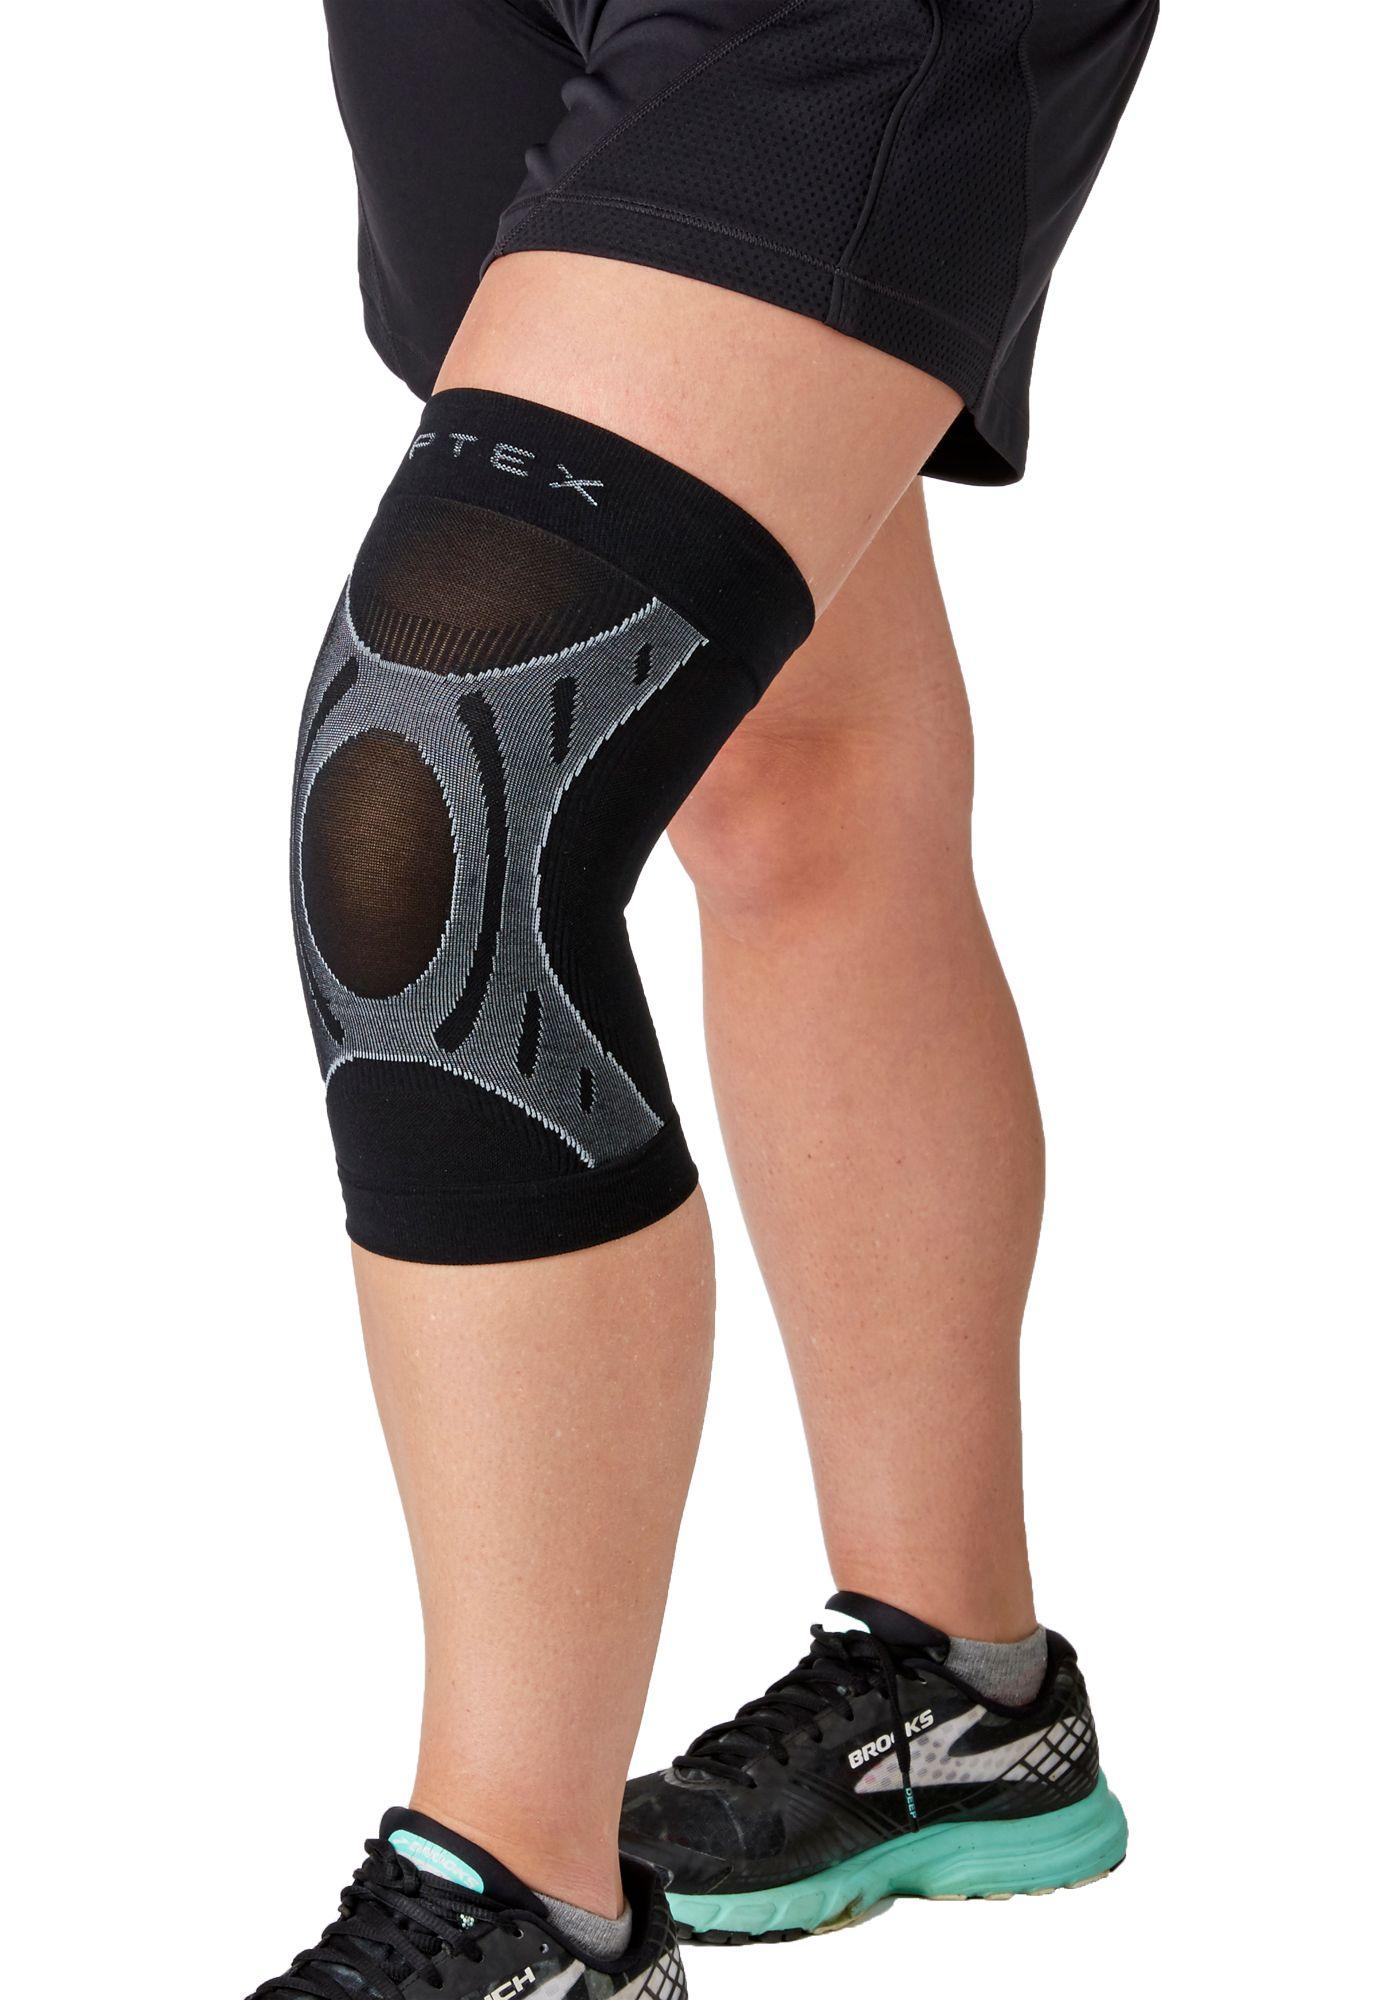 P-TEX PRO Knit Compression Knee Sleeve